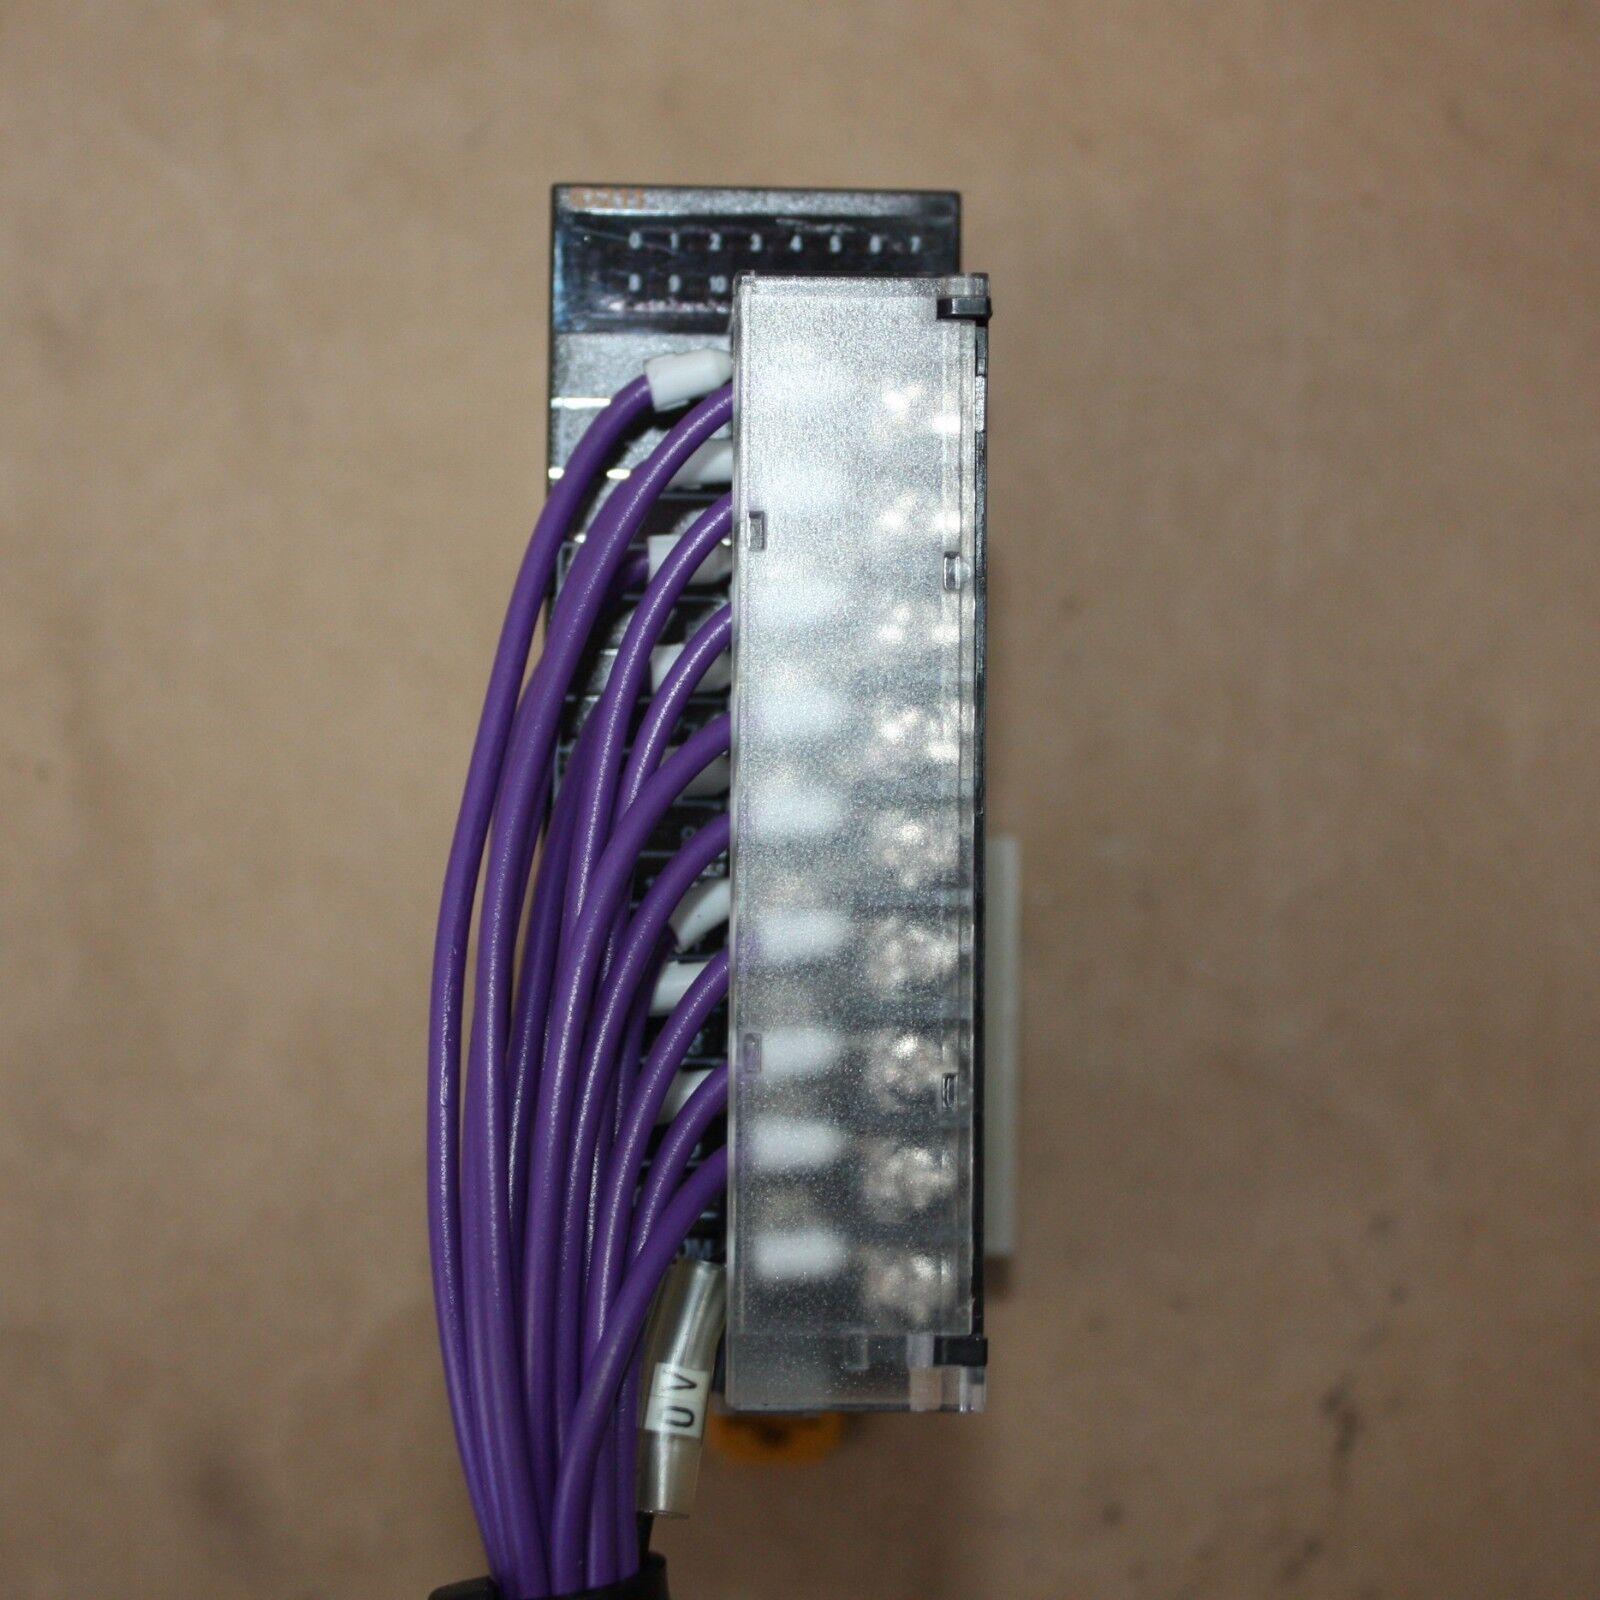 OMRON SYSMAC I O INPUT MODULE 16 Channel 24DC 7mA CJ1W-ID211 PLC